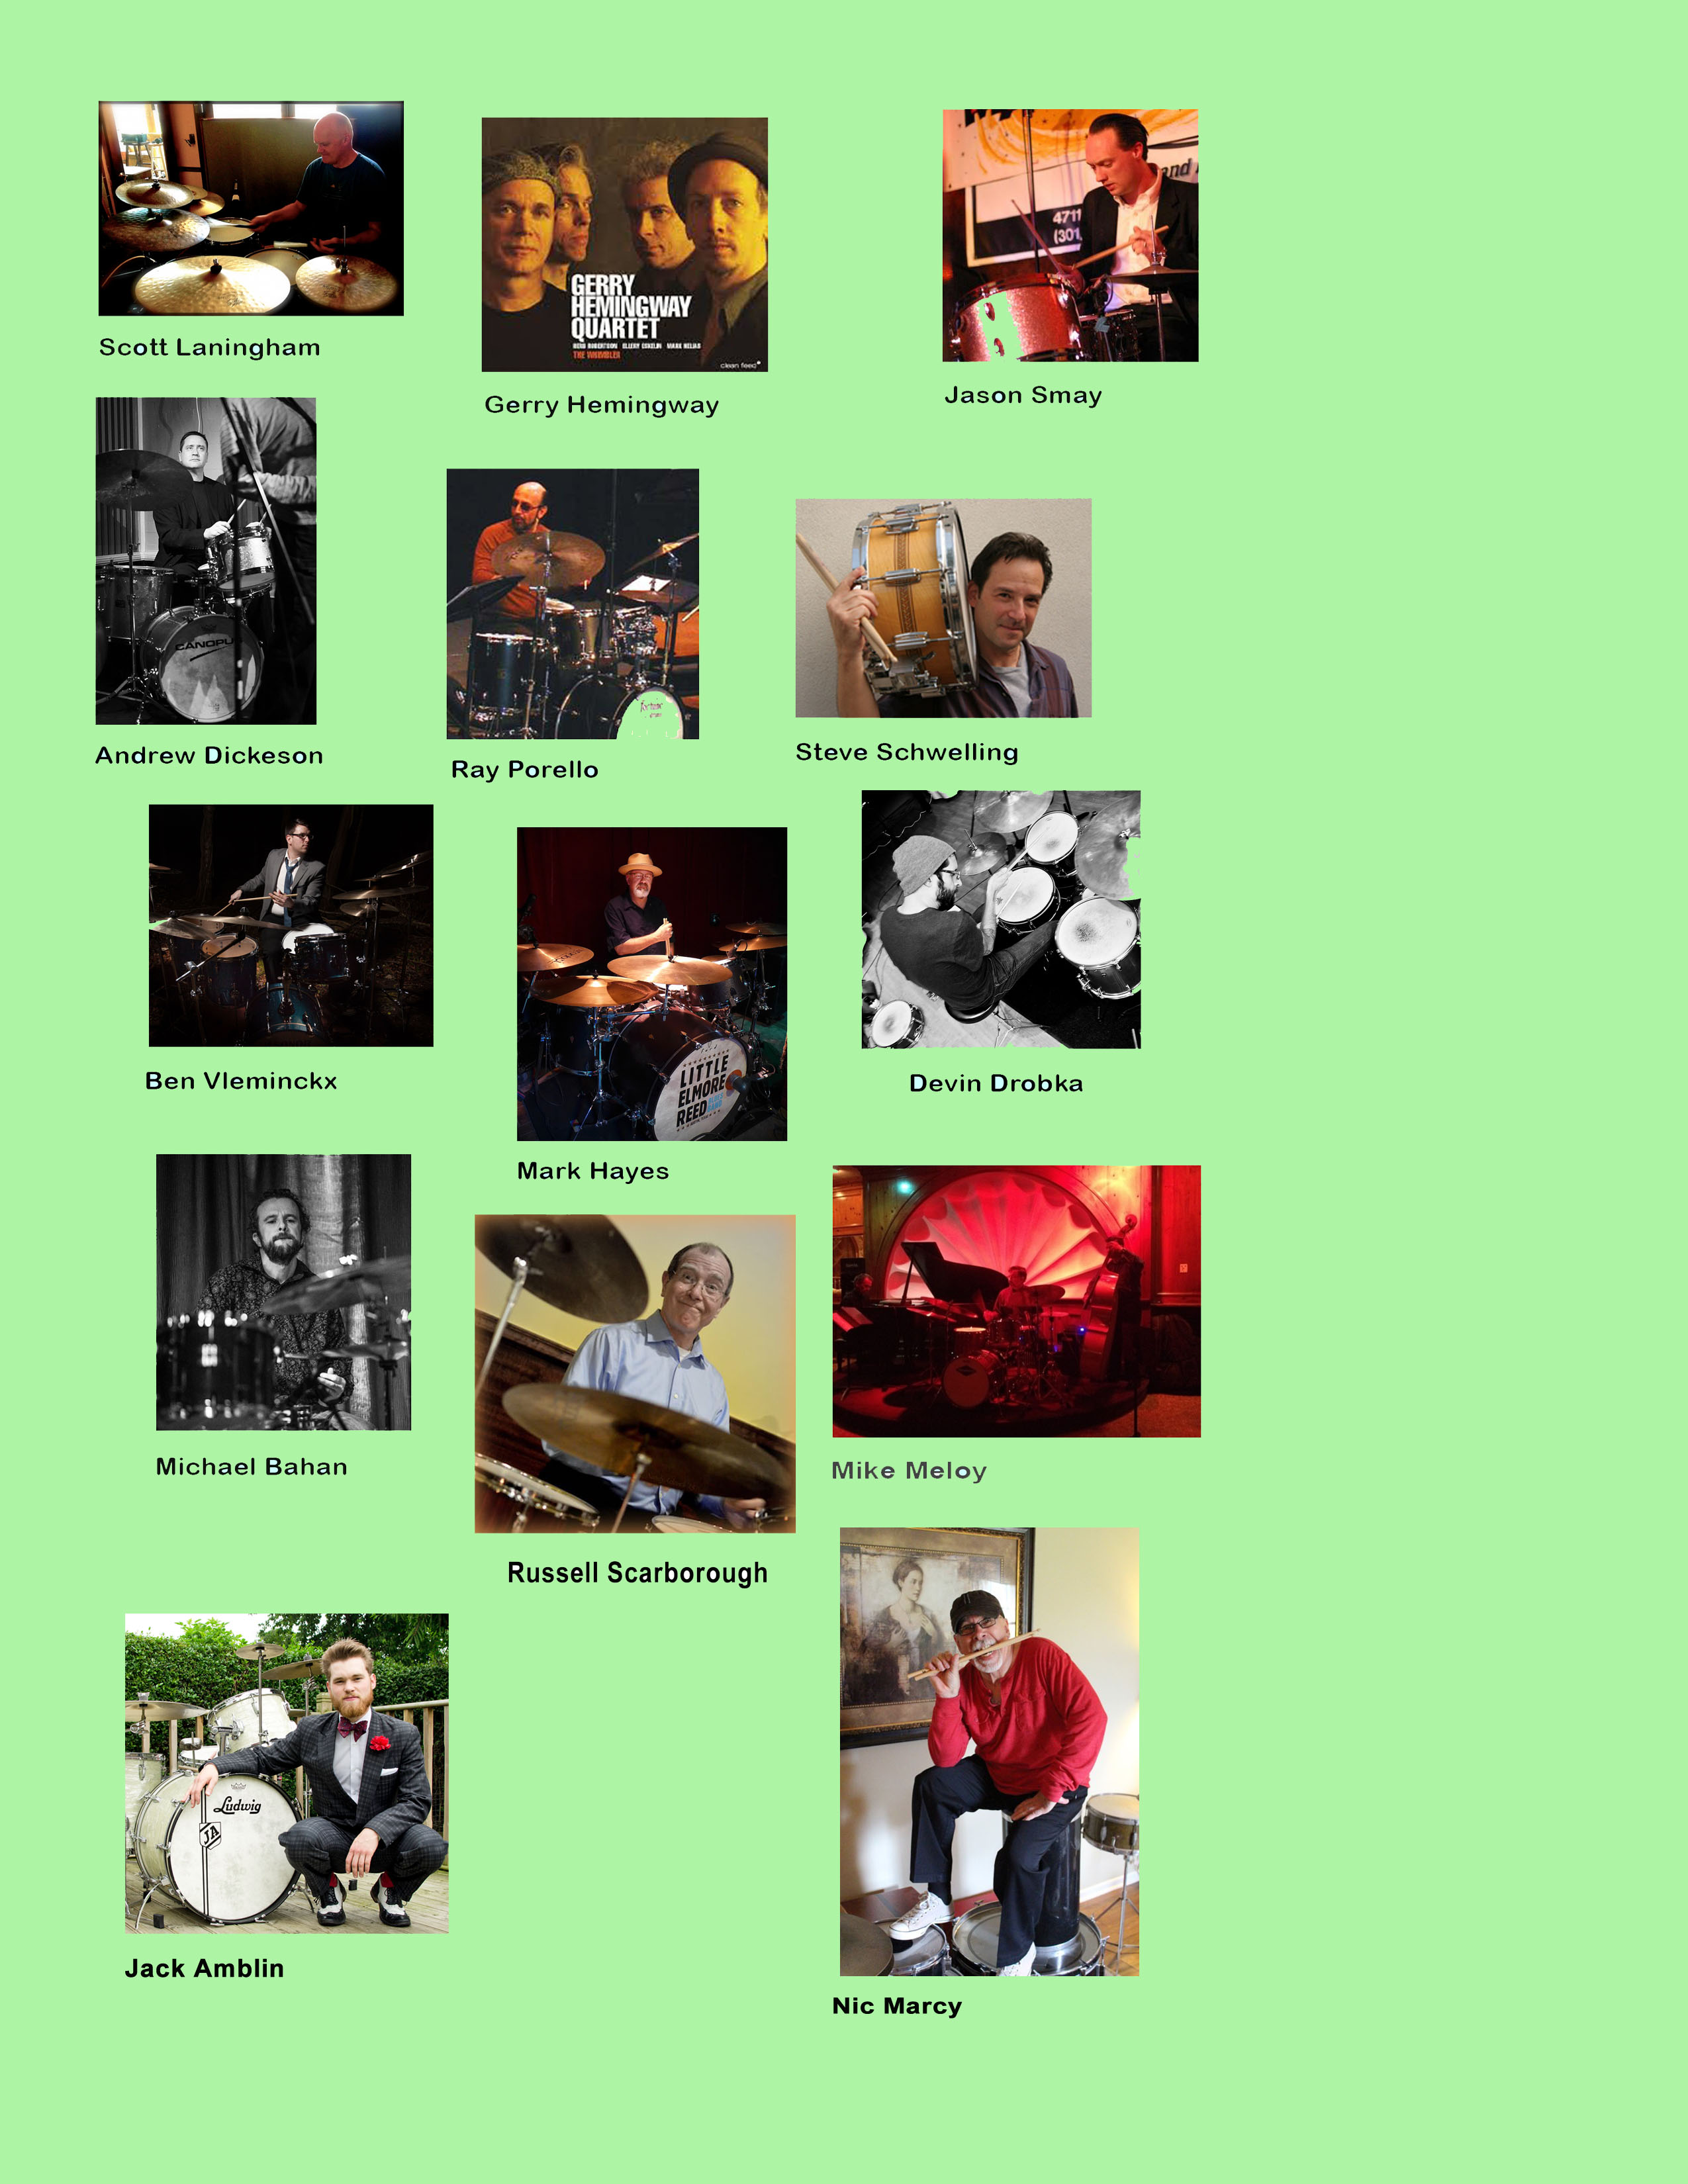 bopworks-artists-page-udatd-3-8-17.jpg